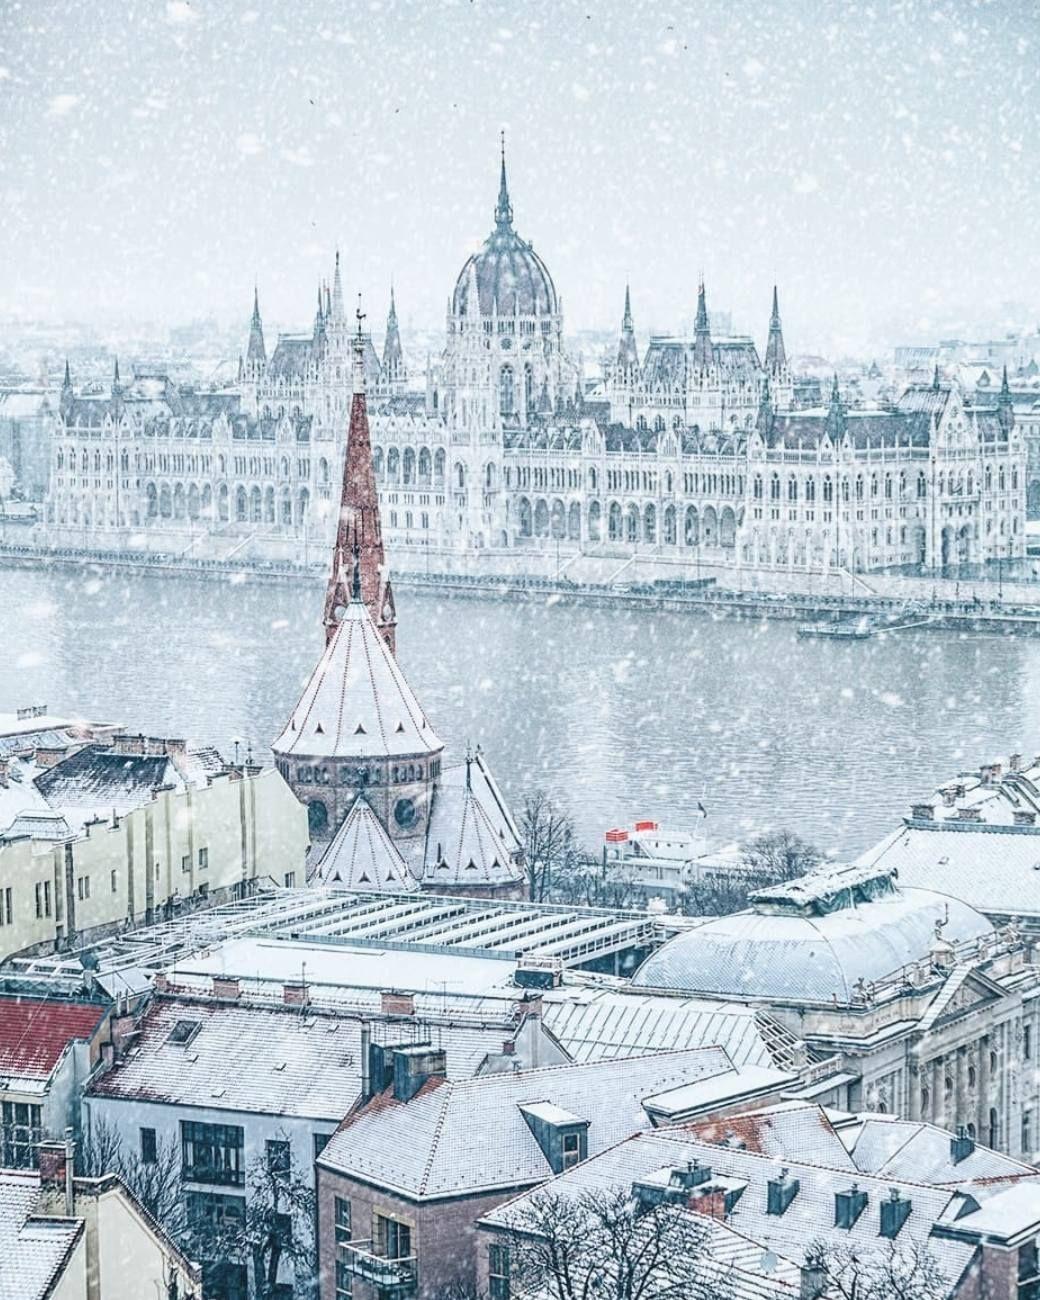 Voyage Travel Vacances Budapest Europe Destinations Photographie Monde Week End Boedapest Hongarije Boedapest Hongarije